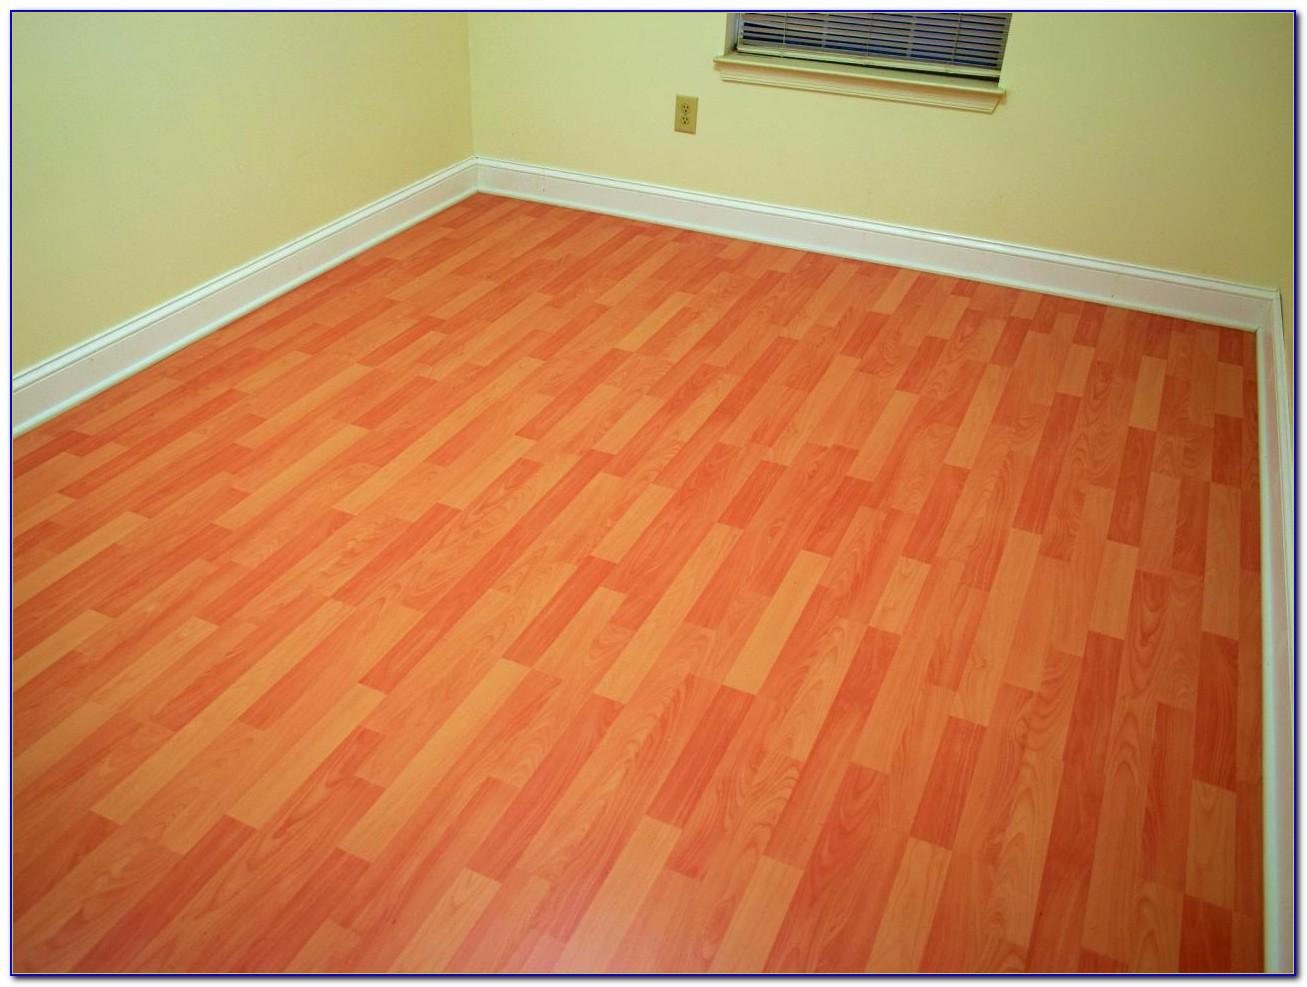 Installing Laminate Wood Flooring In Multiple Rooms